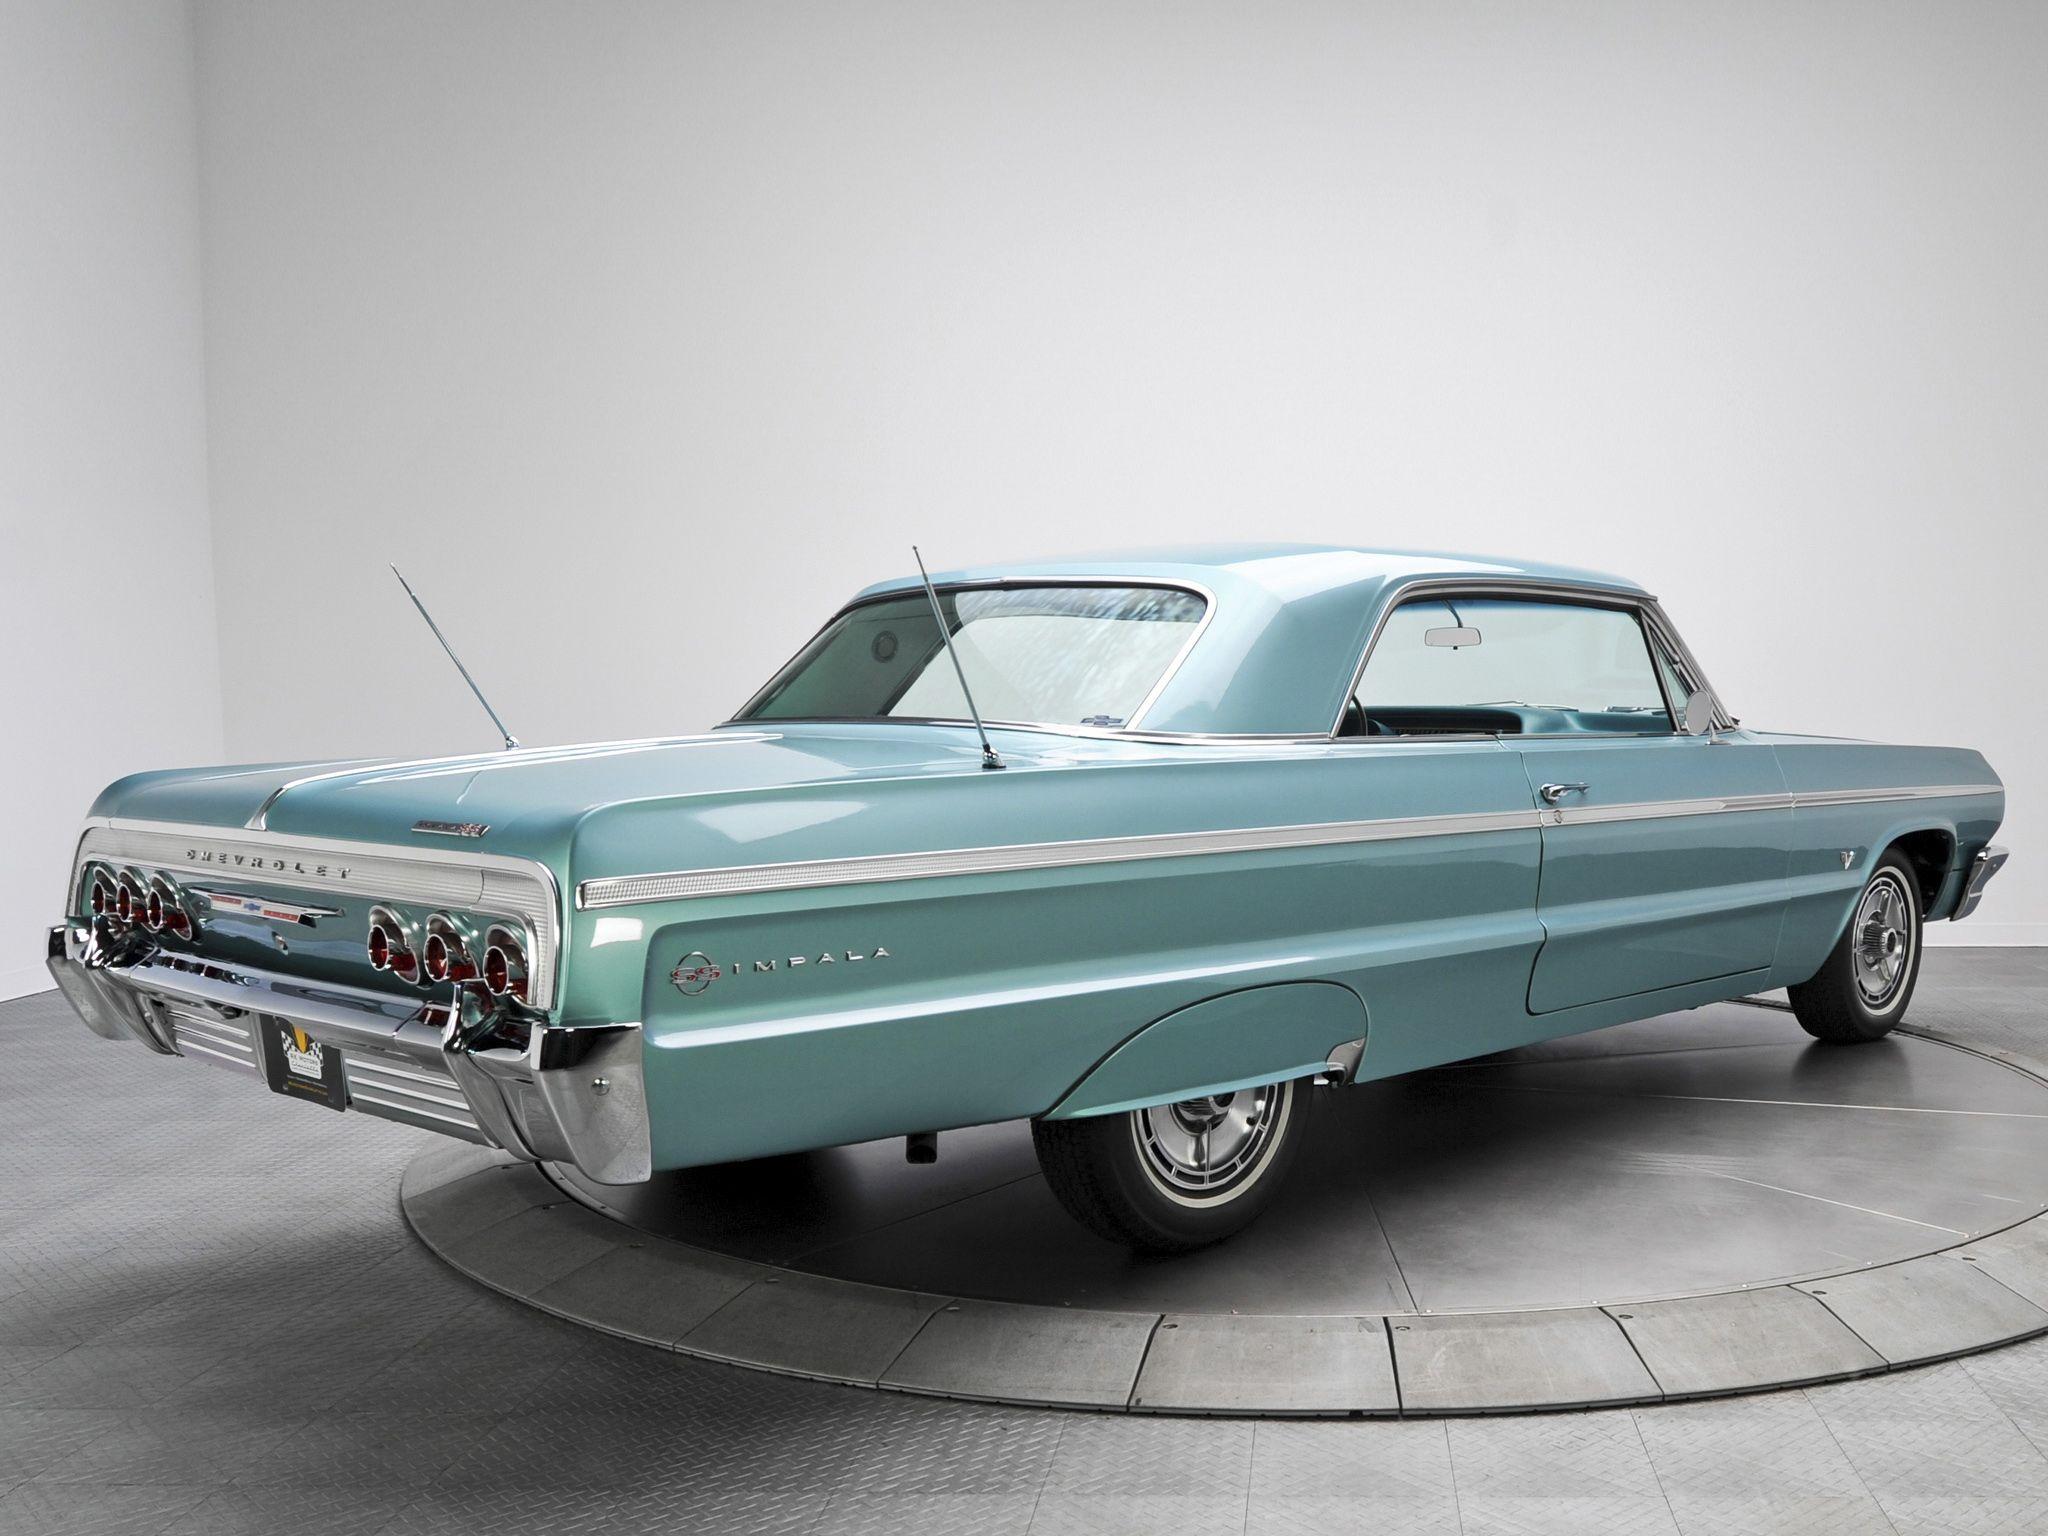 Chevrolet impala ss 1964